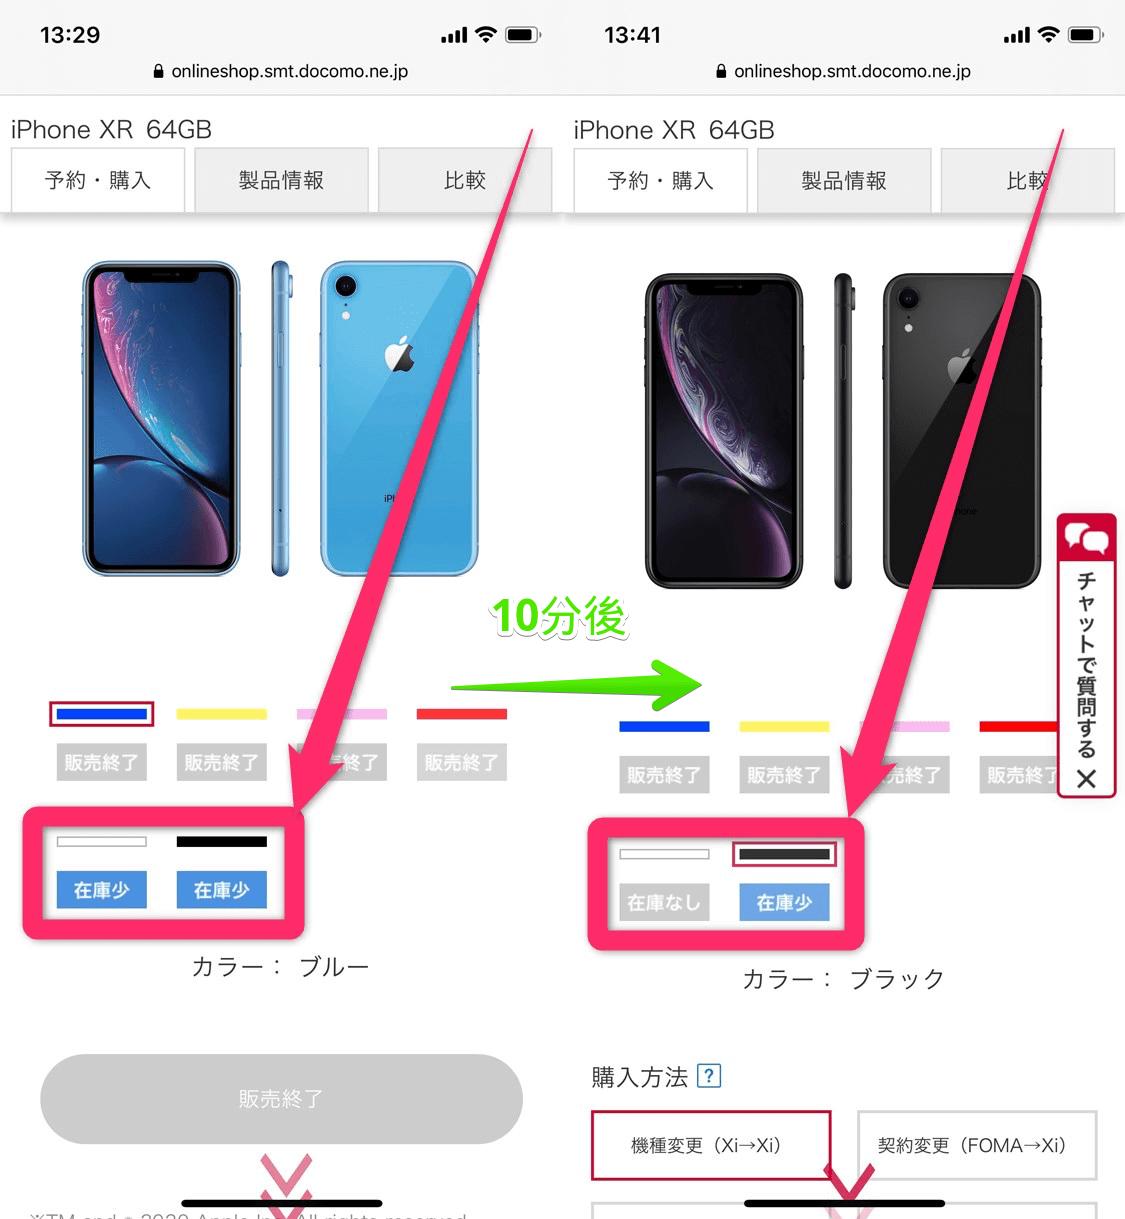 iPhoneXR在庫あり